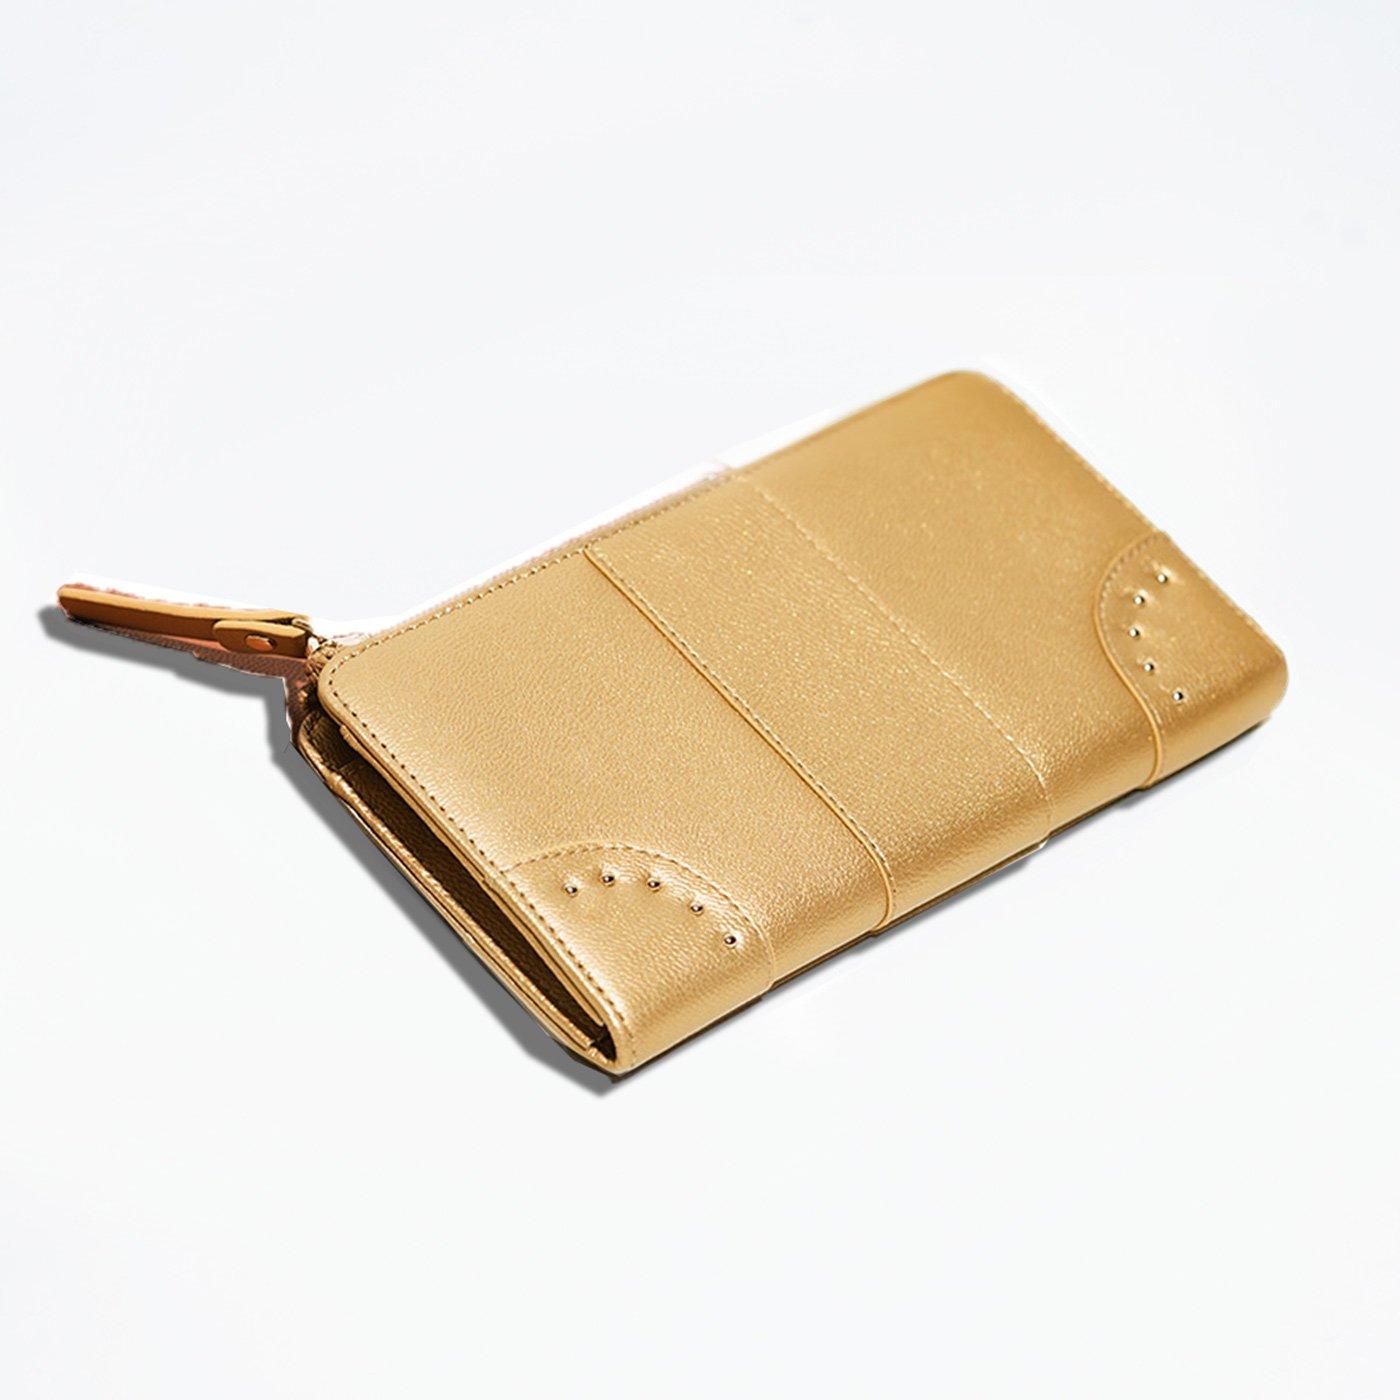 IEDIT[イディット]  ファスナー開きがワンアクションで使いやすい すっきり大人本革財布〈ゴールド〉